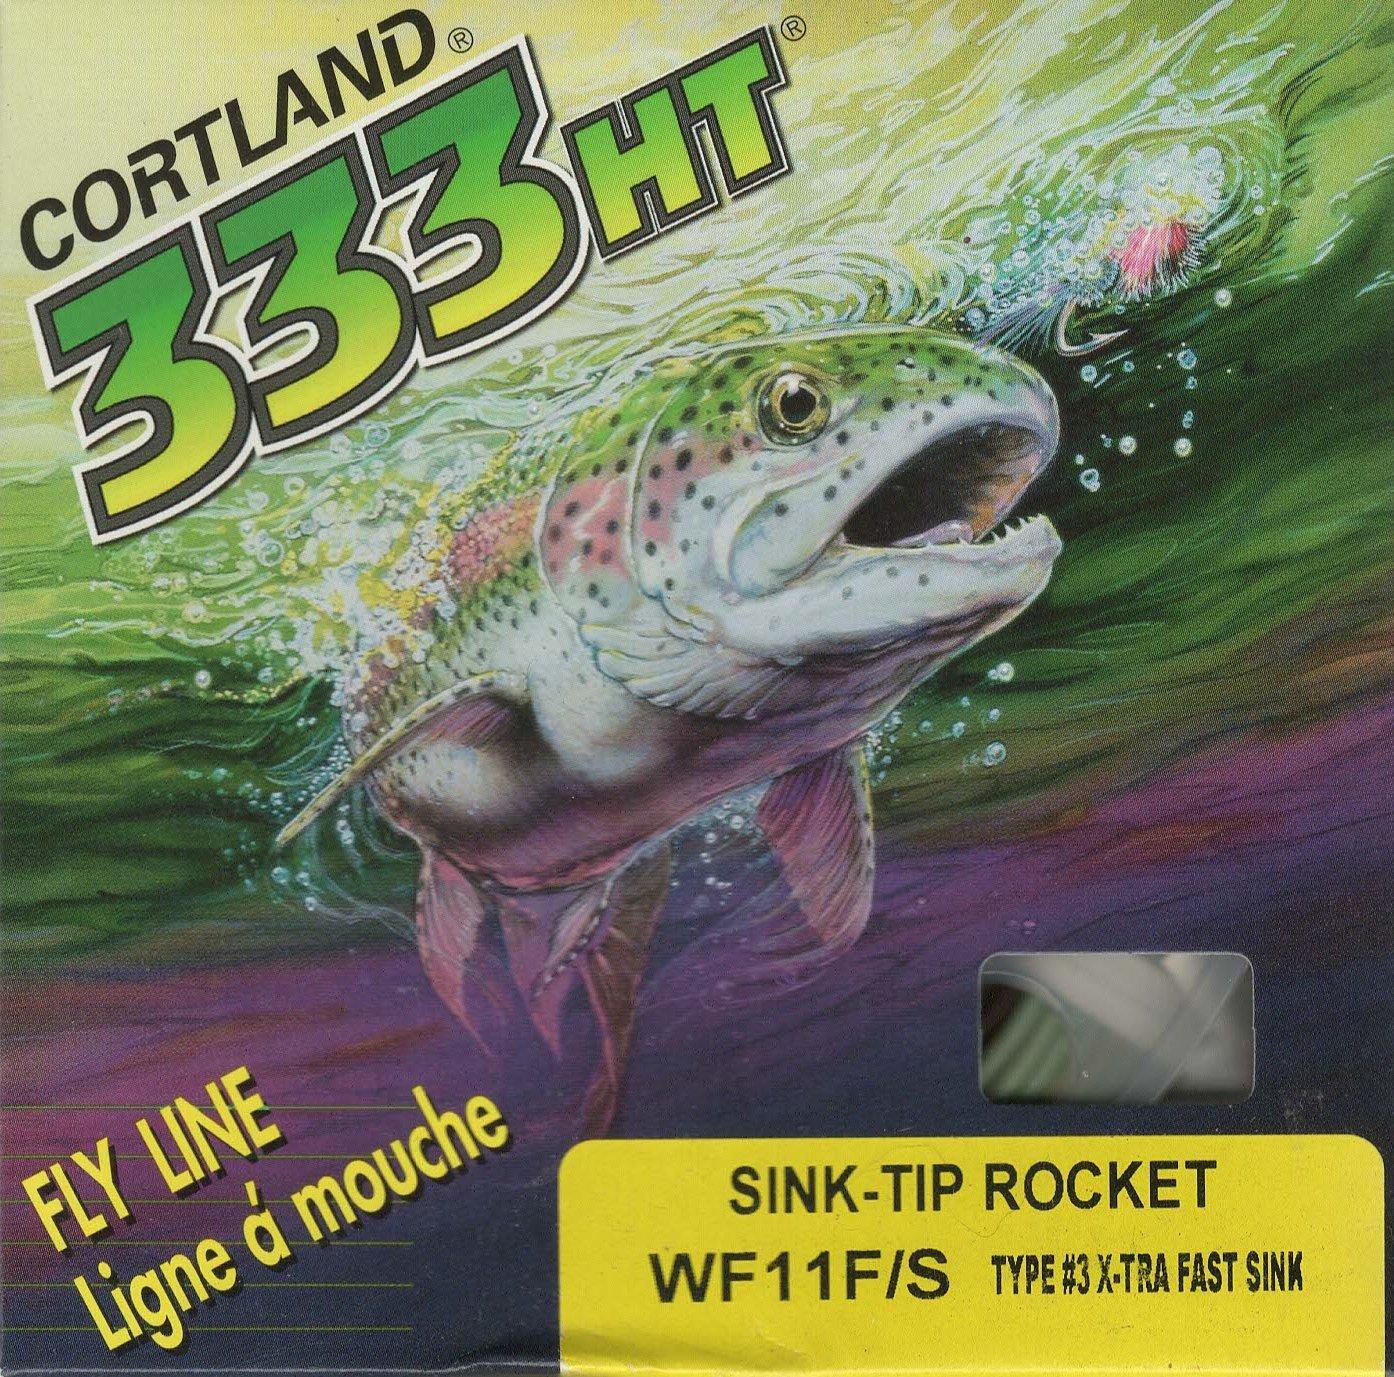 超特価激安 Cortland X Line sink-tip 35ヤード。 t3 XFast X wf11 Fly Line 35ヤード。 B0771S21MZ, Select Space Colors (SSC):6db79562 --- a0267596.xsph.ru